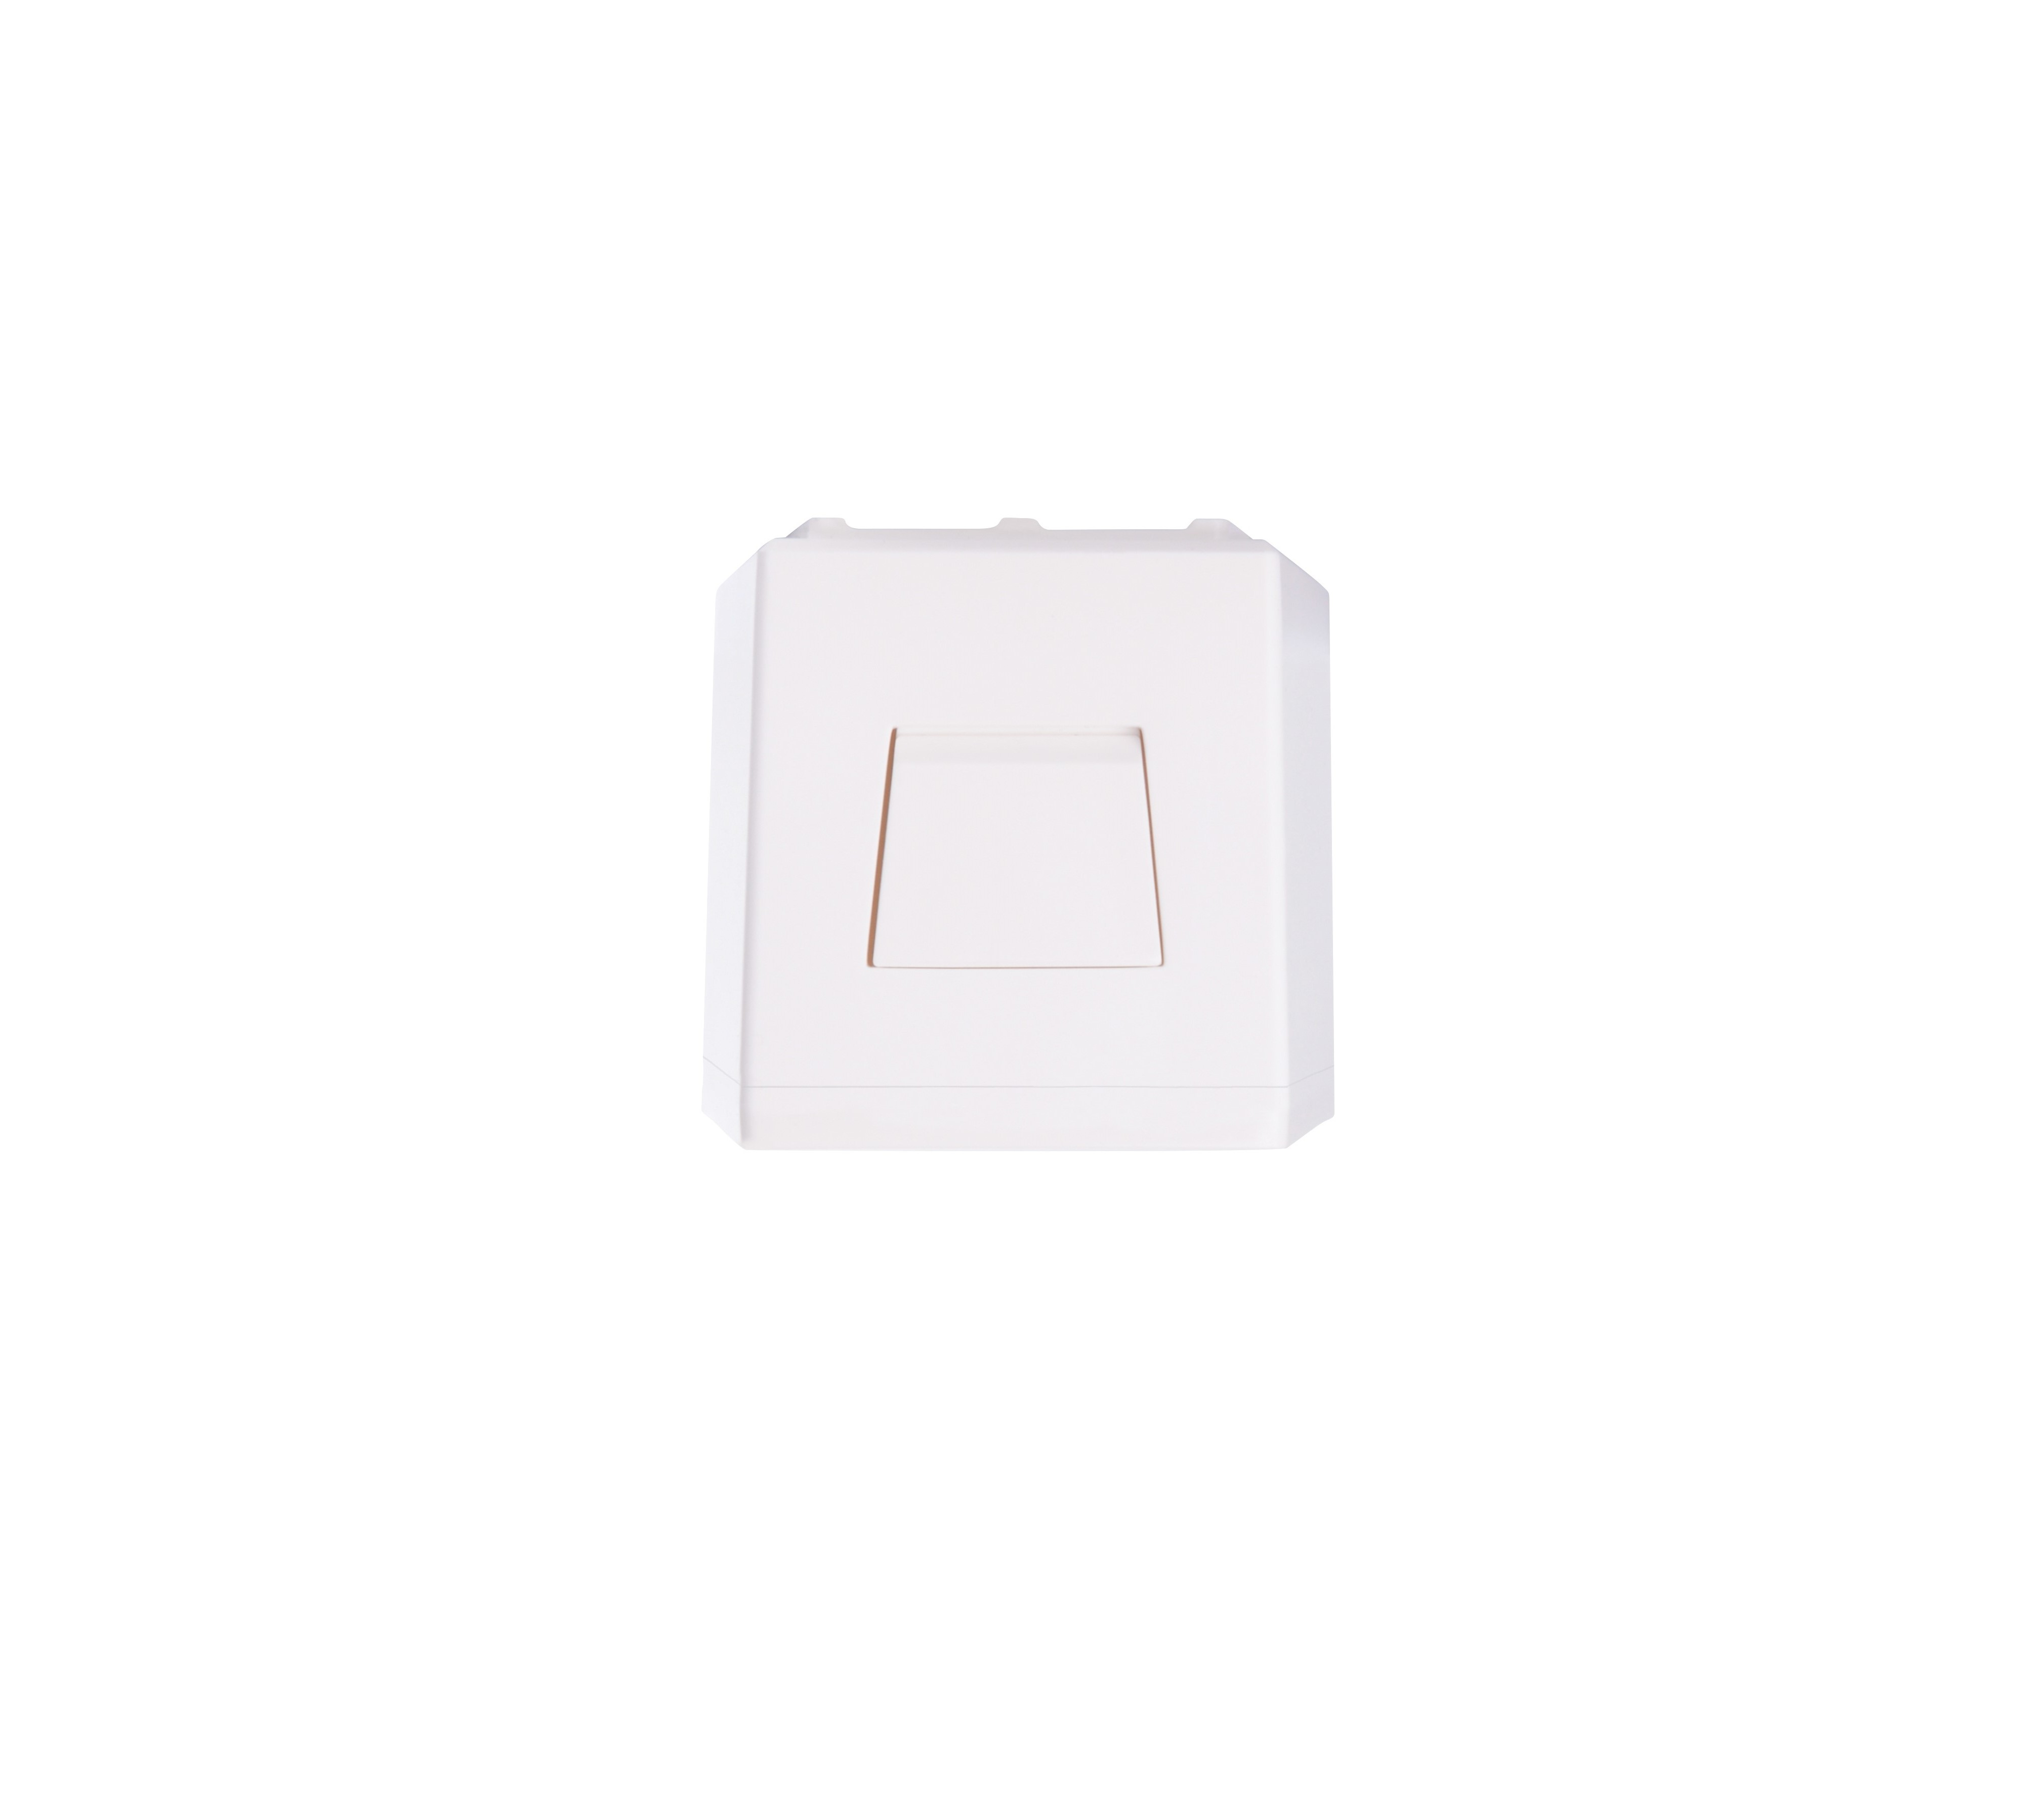 EOL Lampa antipanica led Intelight 94502   3h mentinut test automat [1]